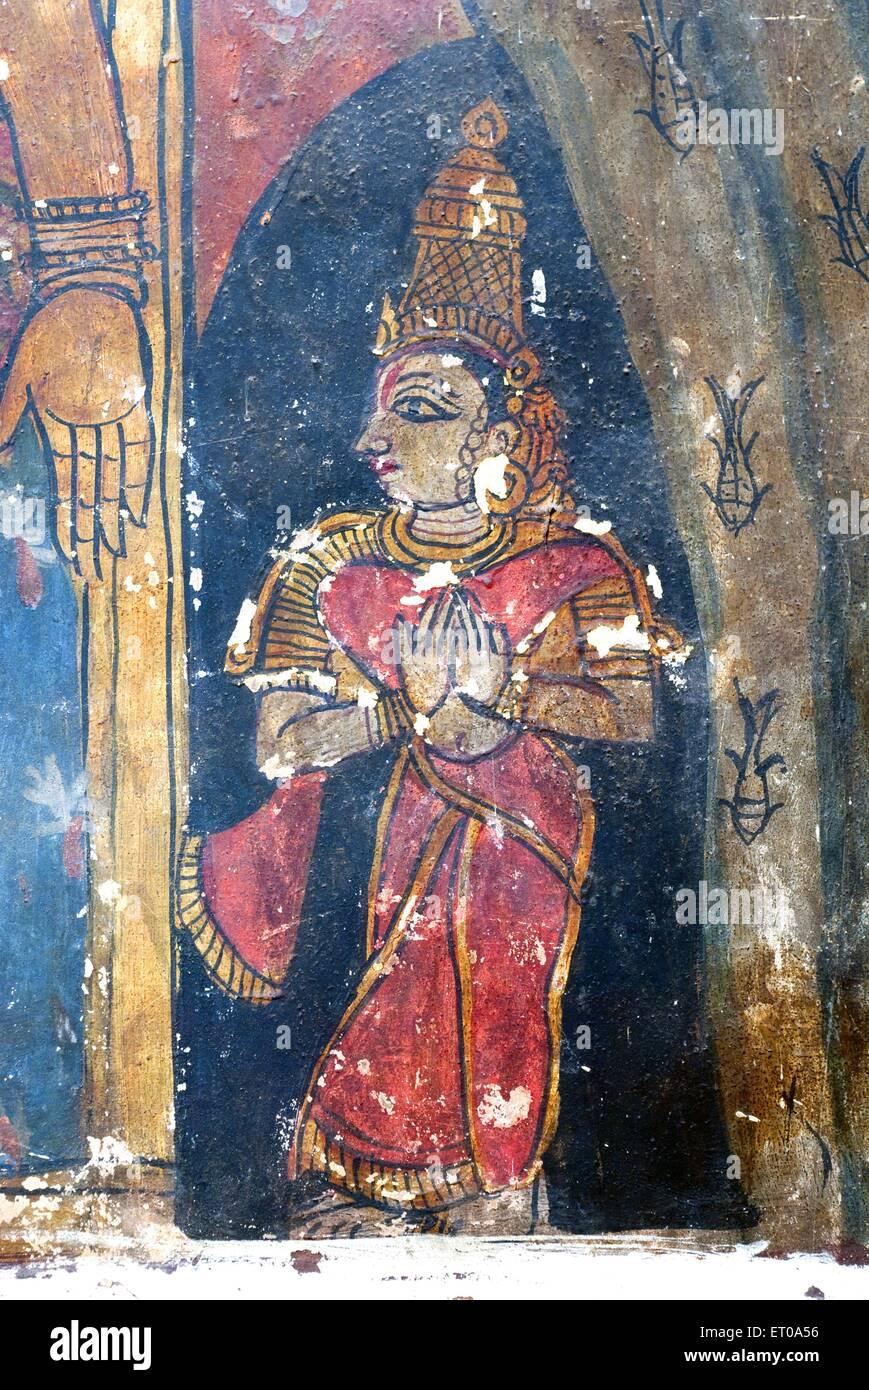 Seventeenth century murals on wall in Varadaraja Perumal Vishnu temple in  Kanchipuram ; Tamil Nadu ; India Stock Photo - Alamy